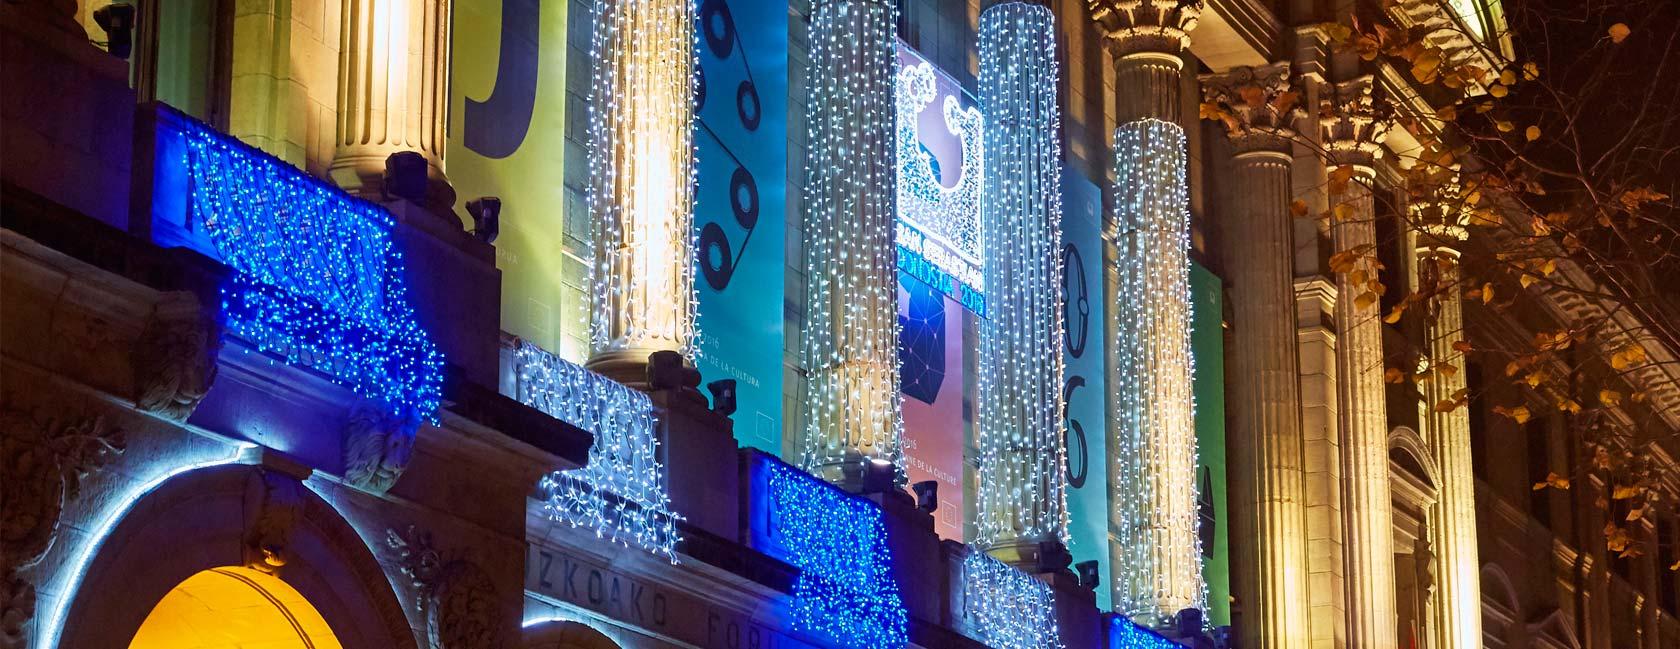 San Sebastian European Capital of Culture 2016